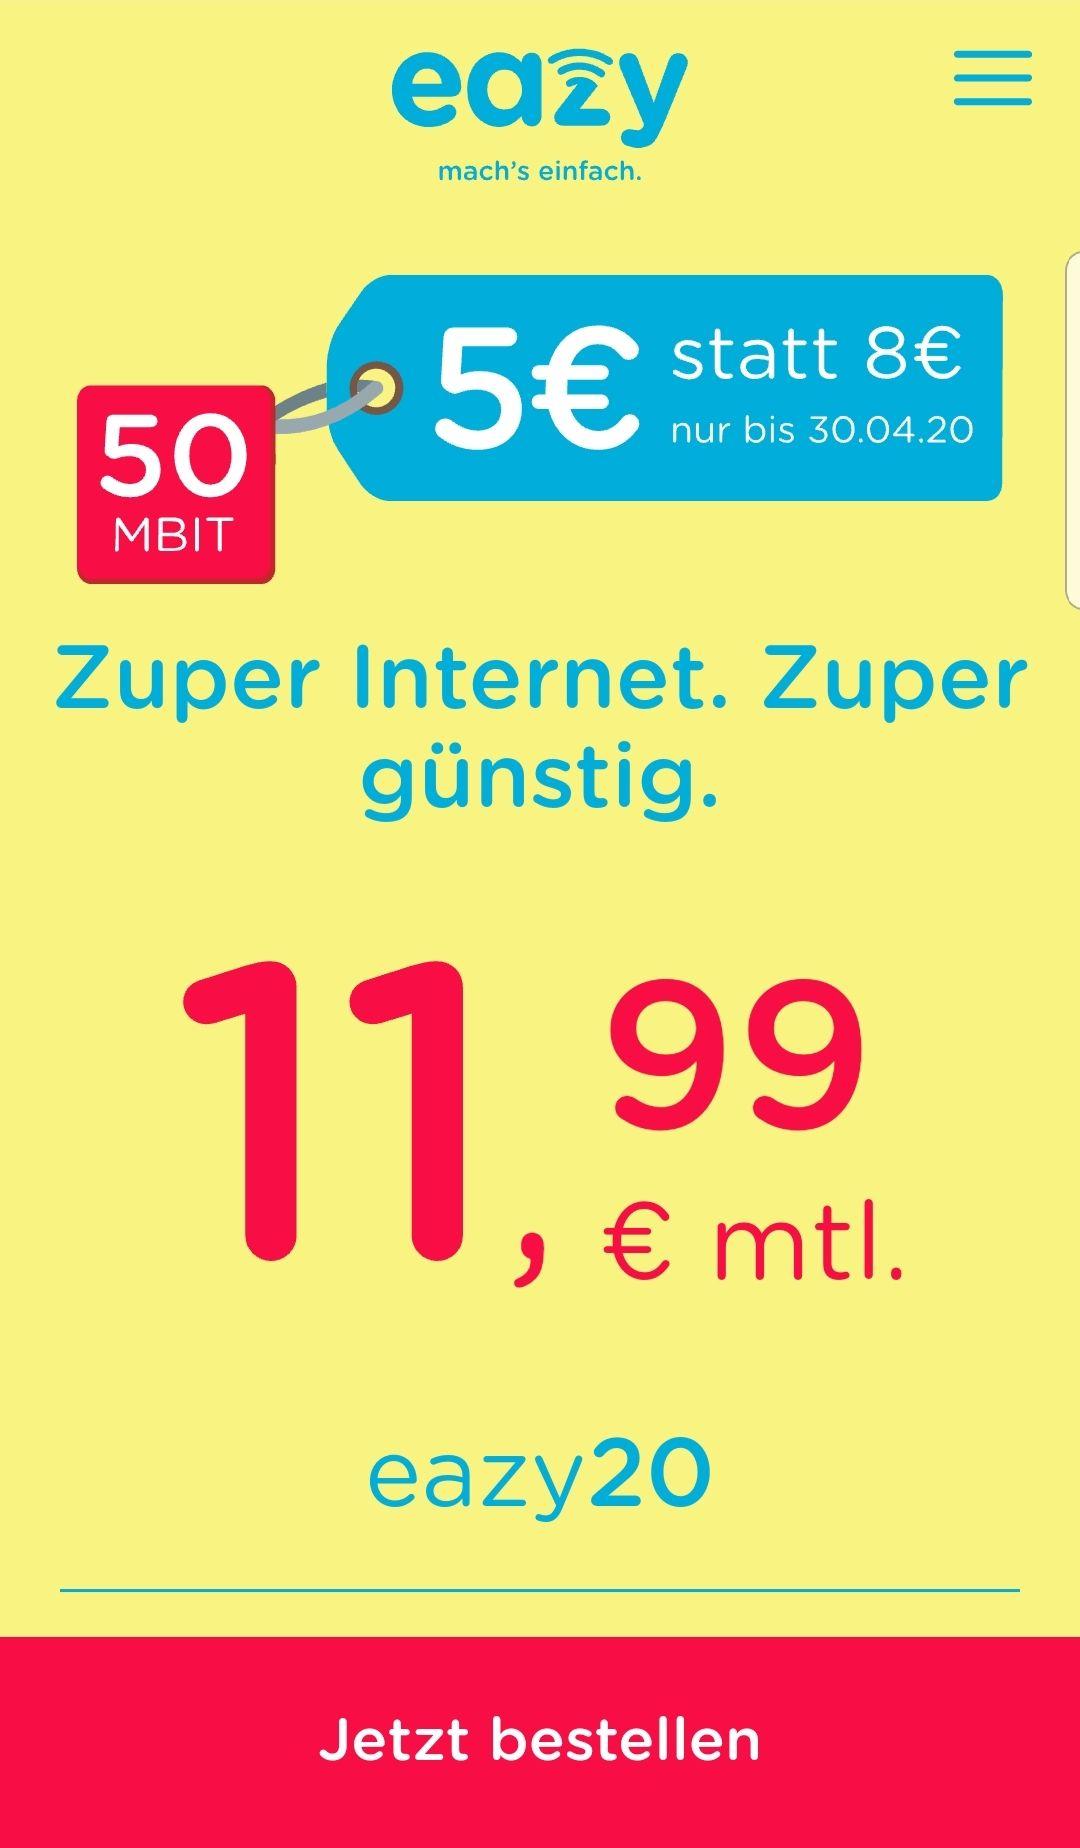 Eazy (Unitymedia) Internetvertrag ab 11.99 Euro, inkl. WLAN Router